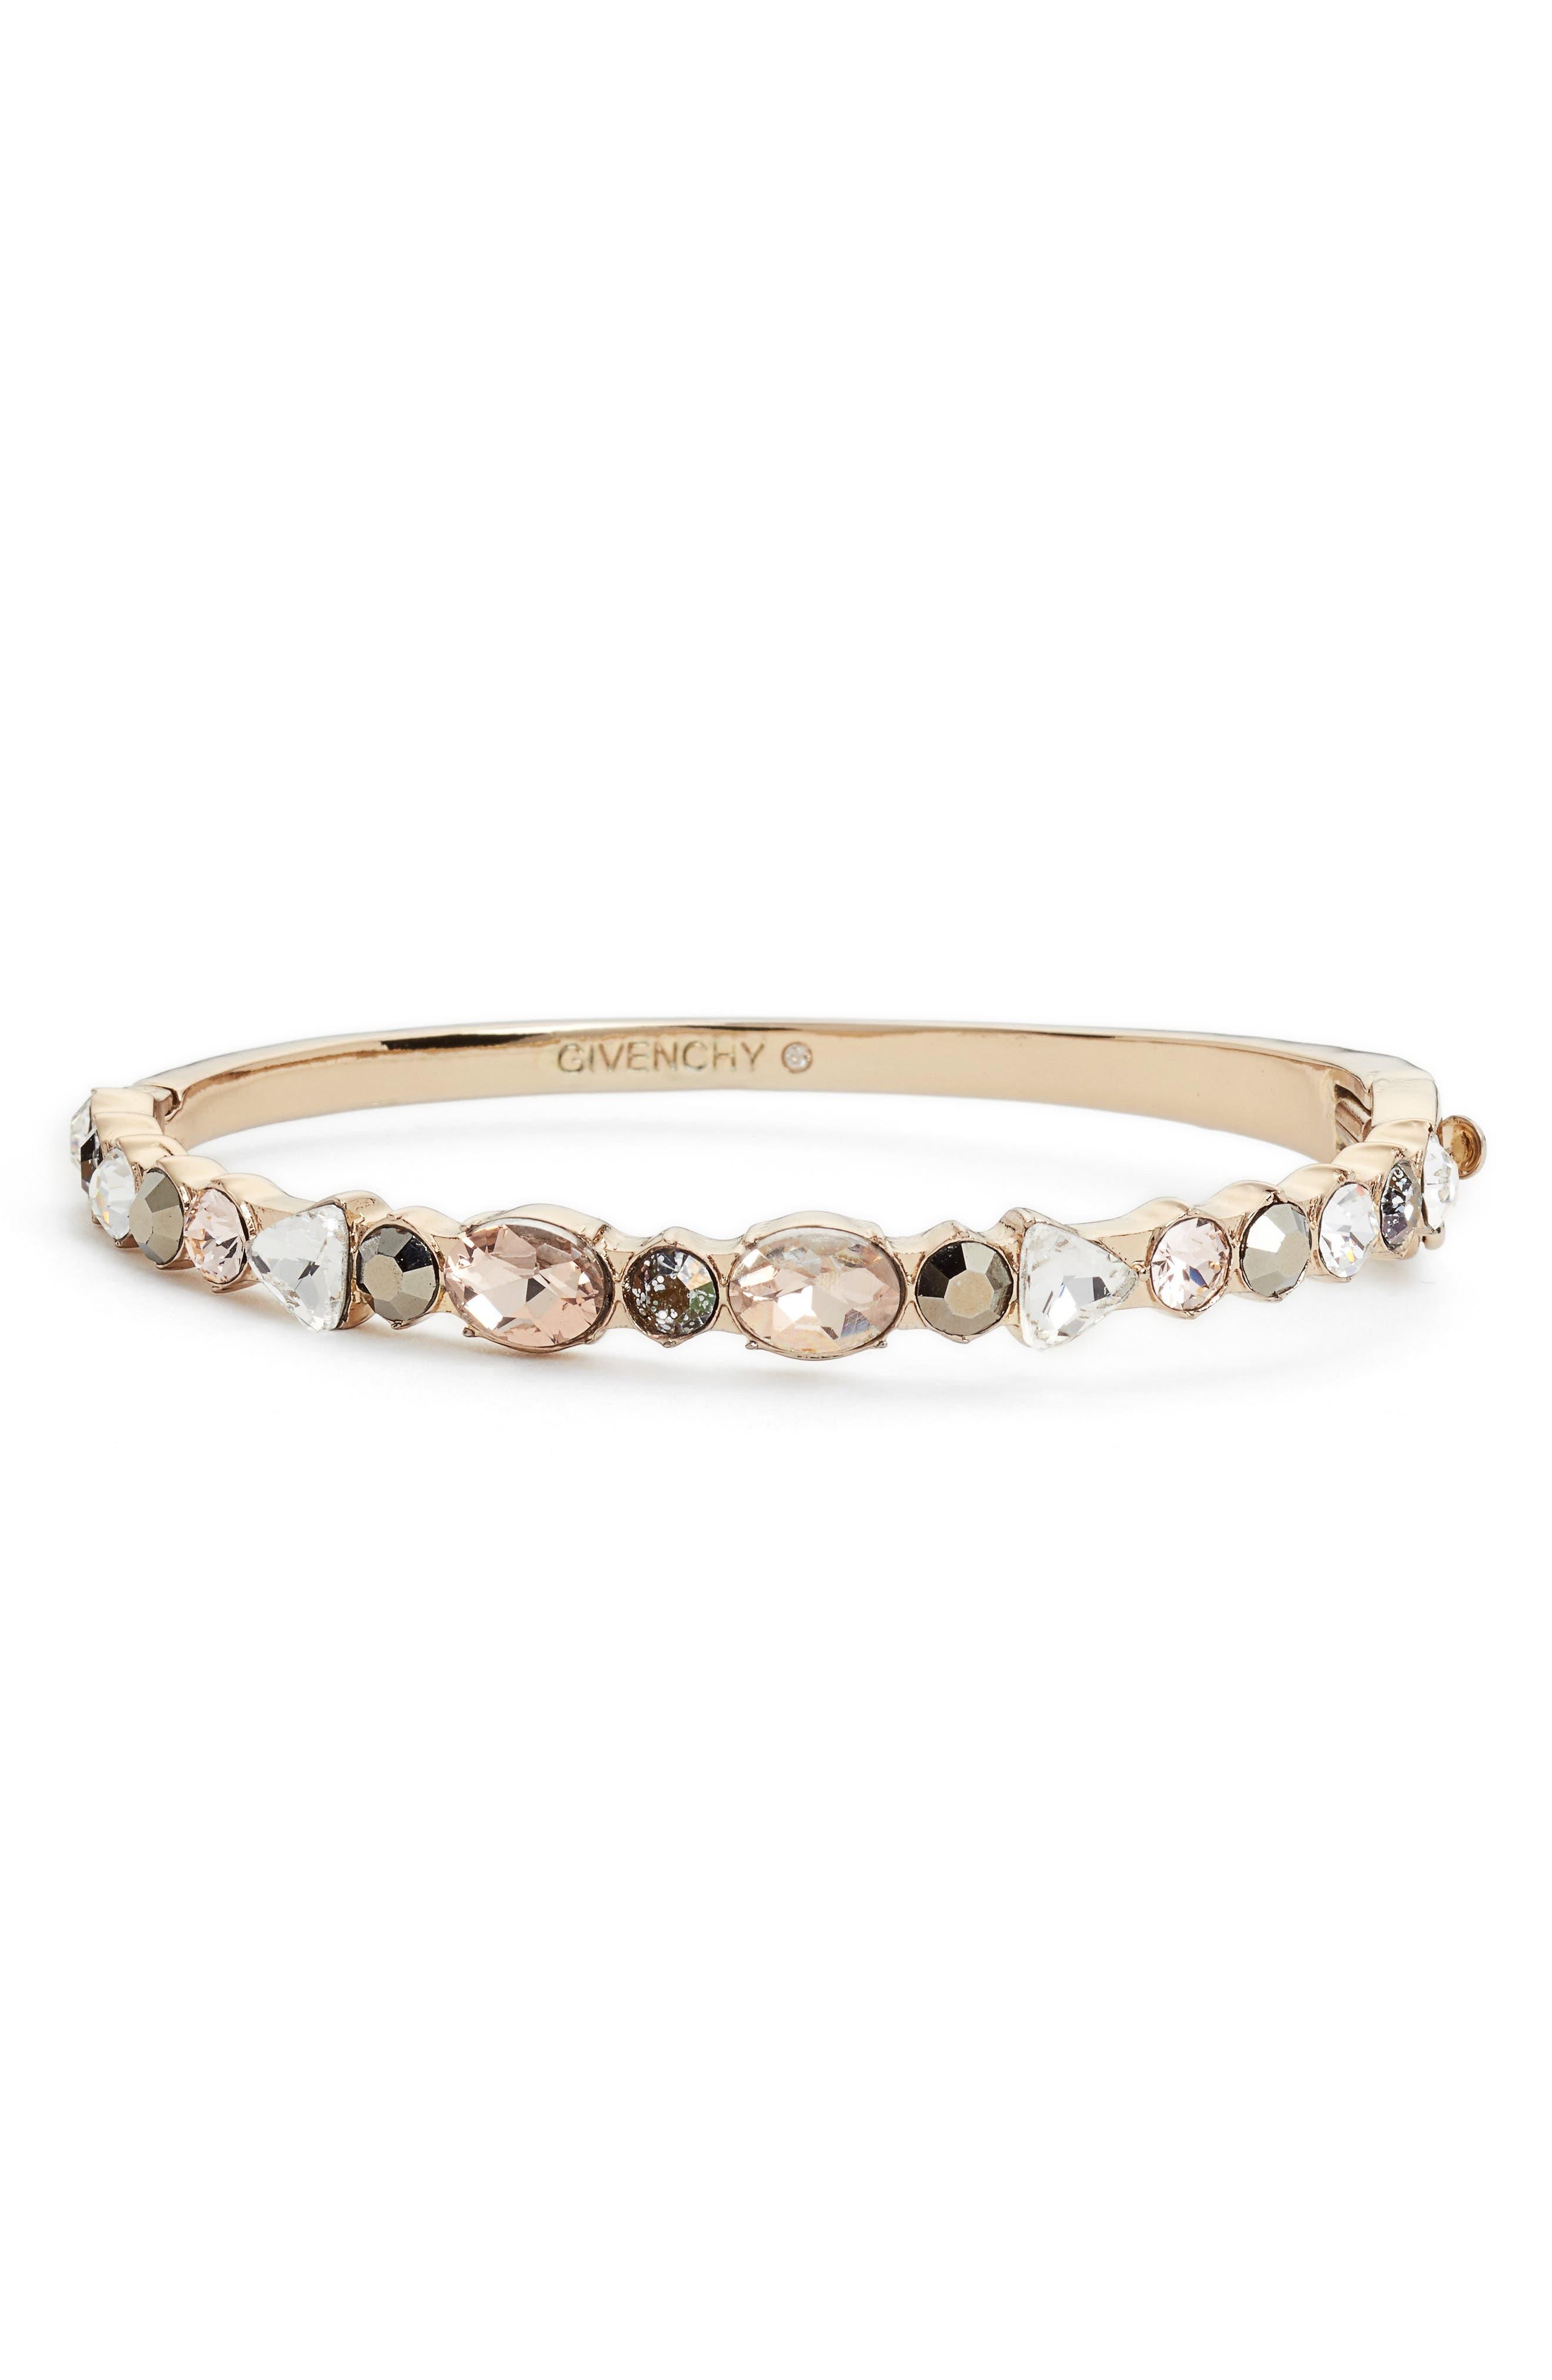 Swarovski Crystal Bracelet,                             Main thumbnail 1, color,